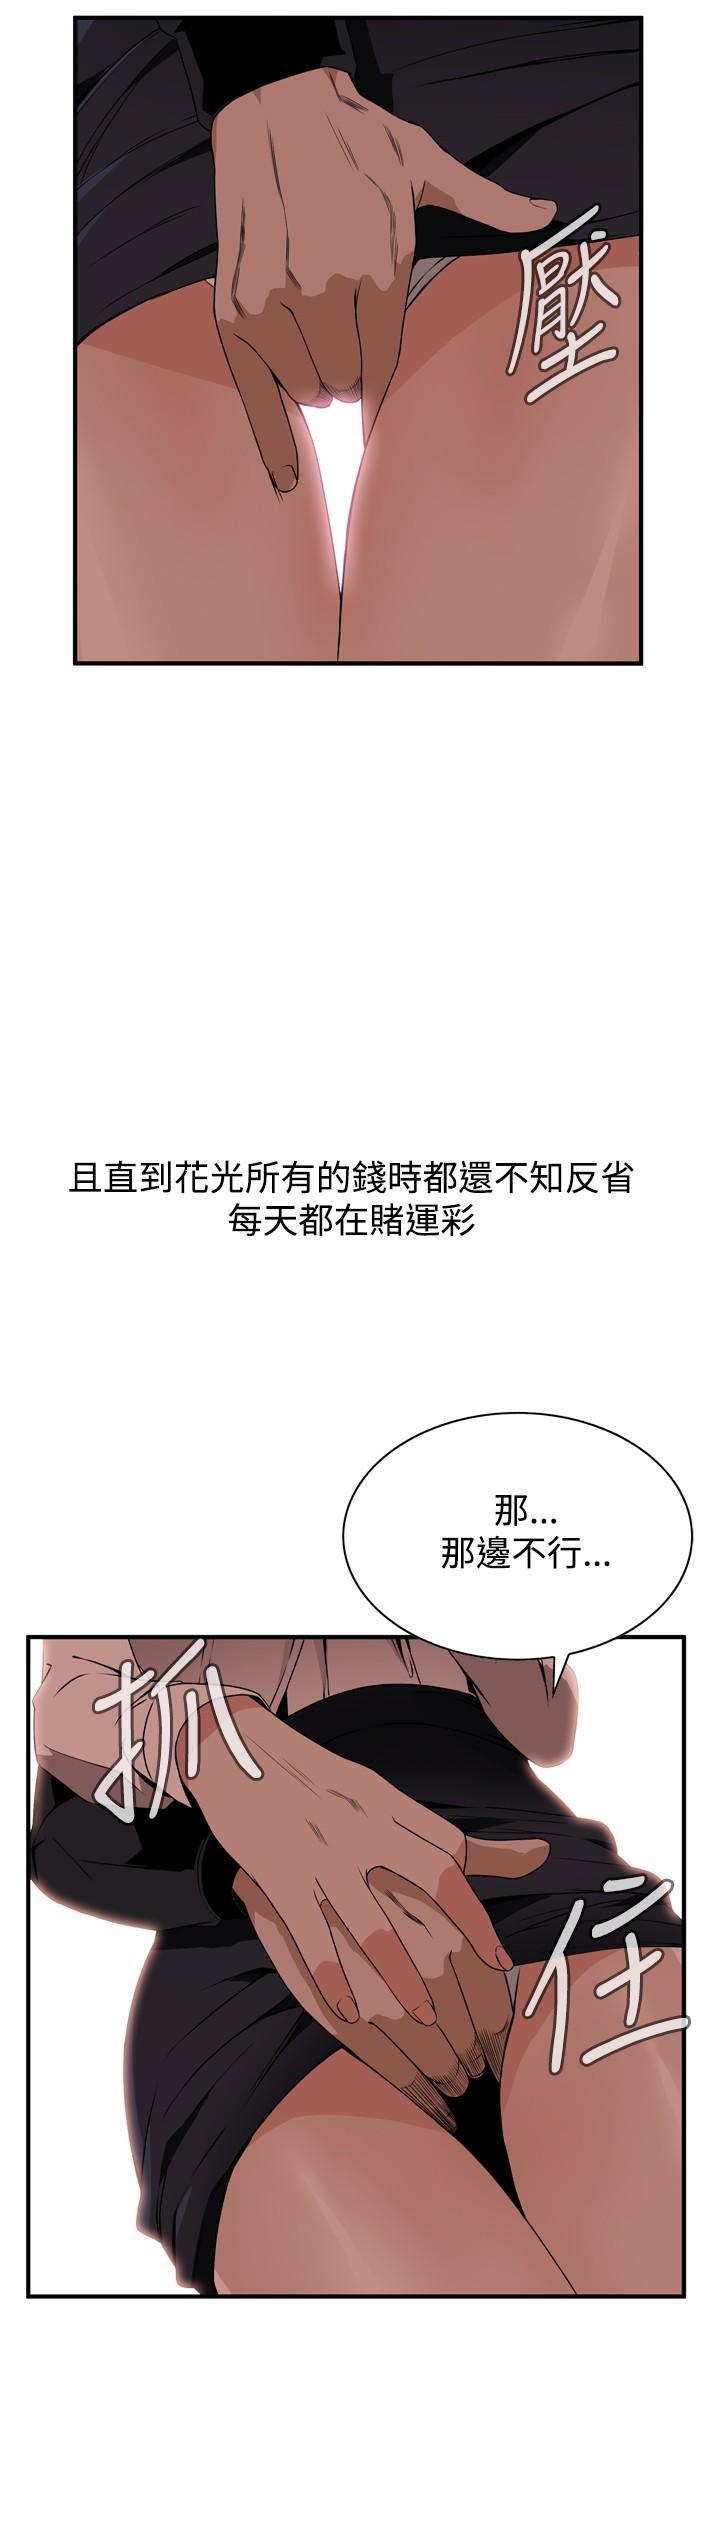 Take a Peek 偷窥 Ch.39~60 [Chinese]中文 38